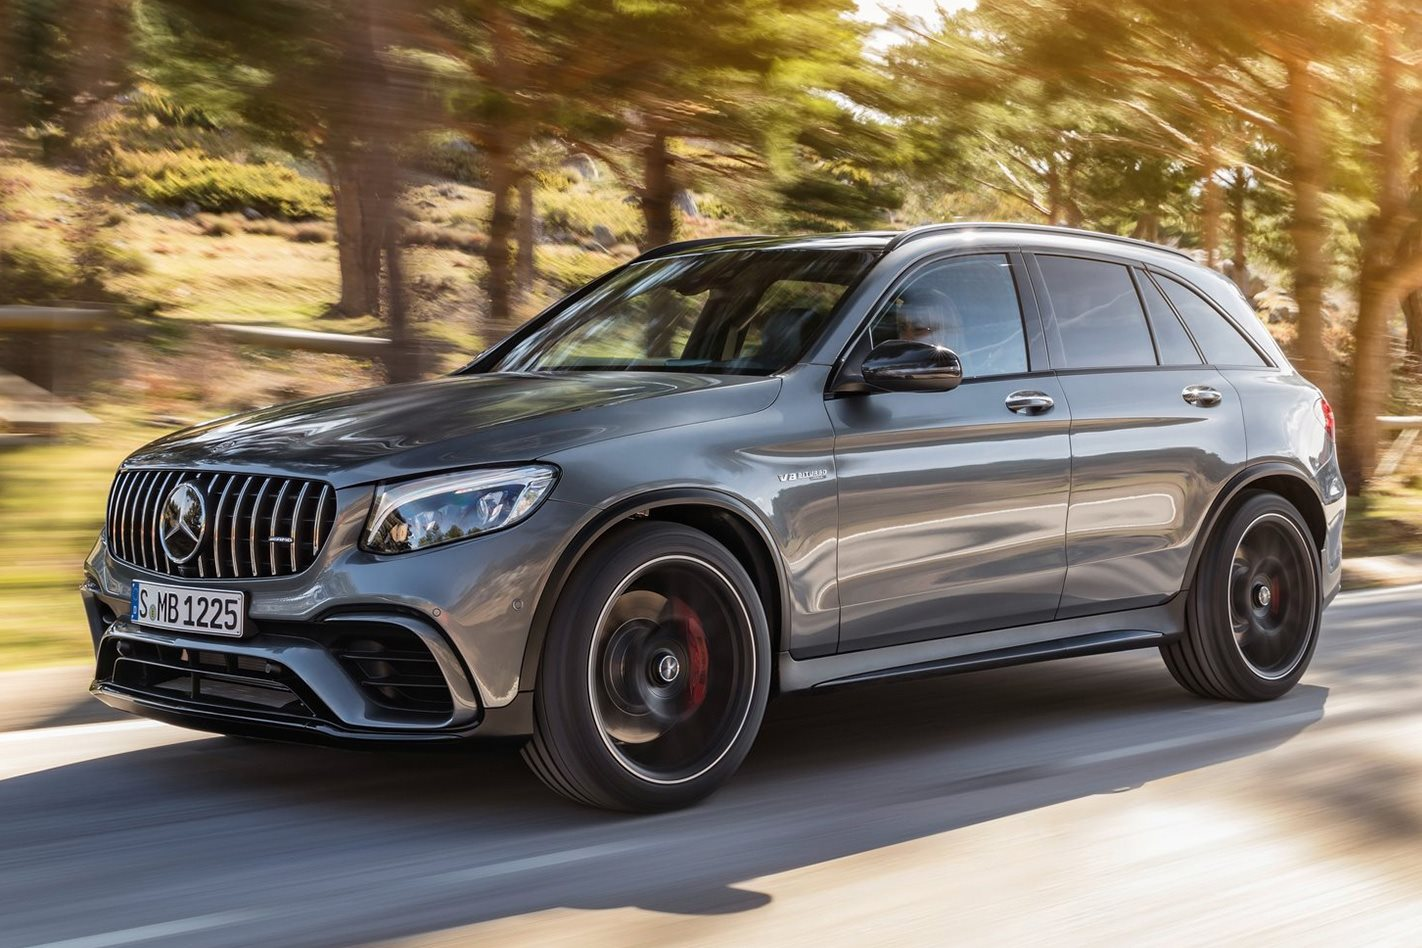 2018-Mercedes-Benz-GLC63-S-AMG.jpg